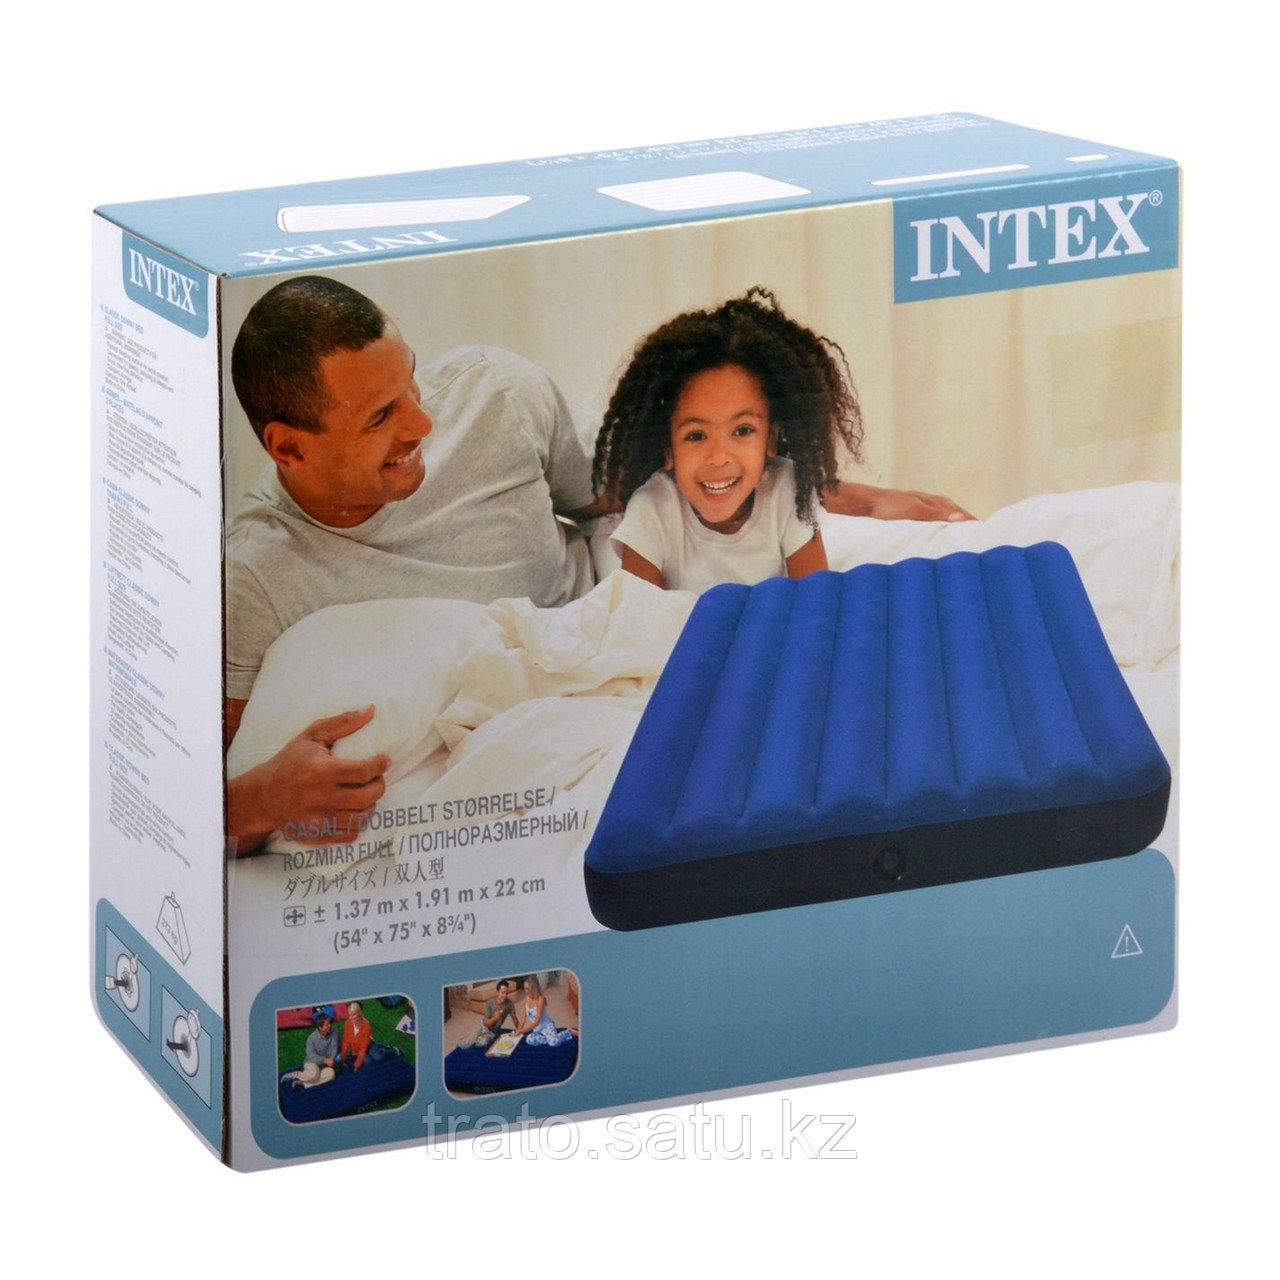 Intex 191x137x25